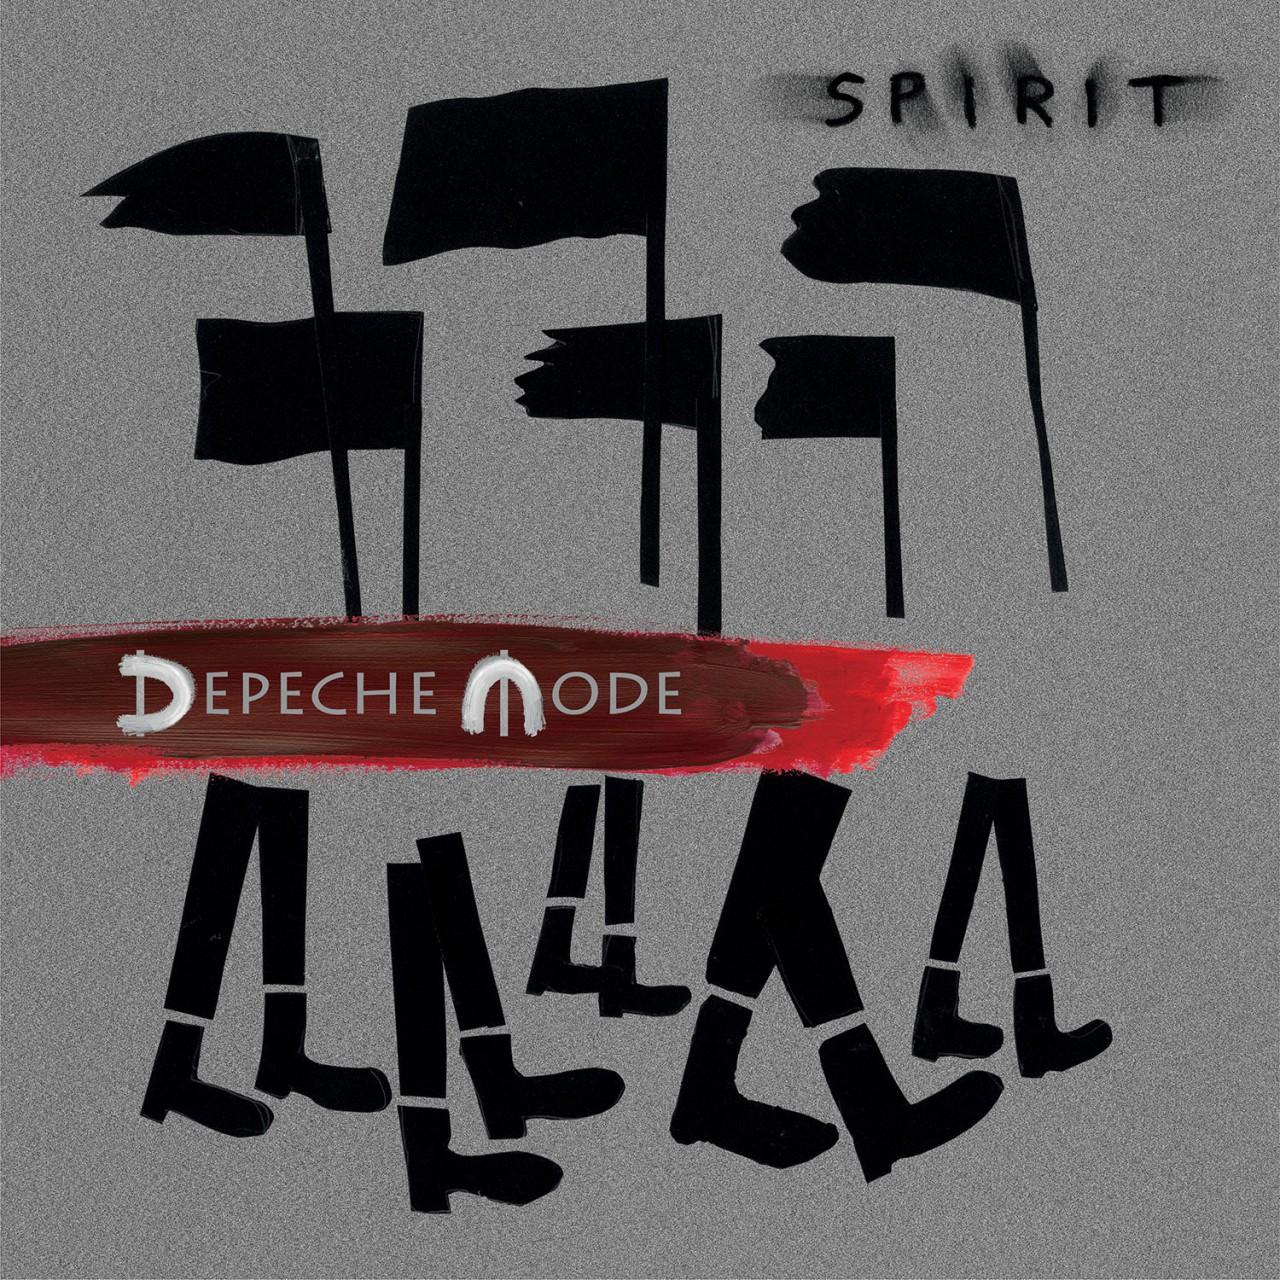 Depeche Mode: Spirit (2017) Book Cover